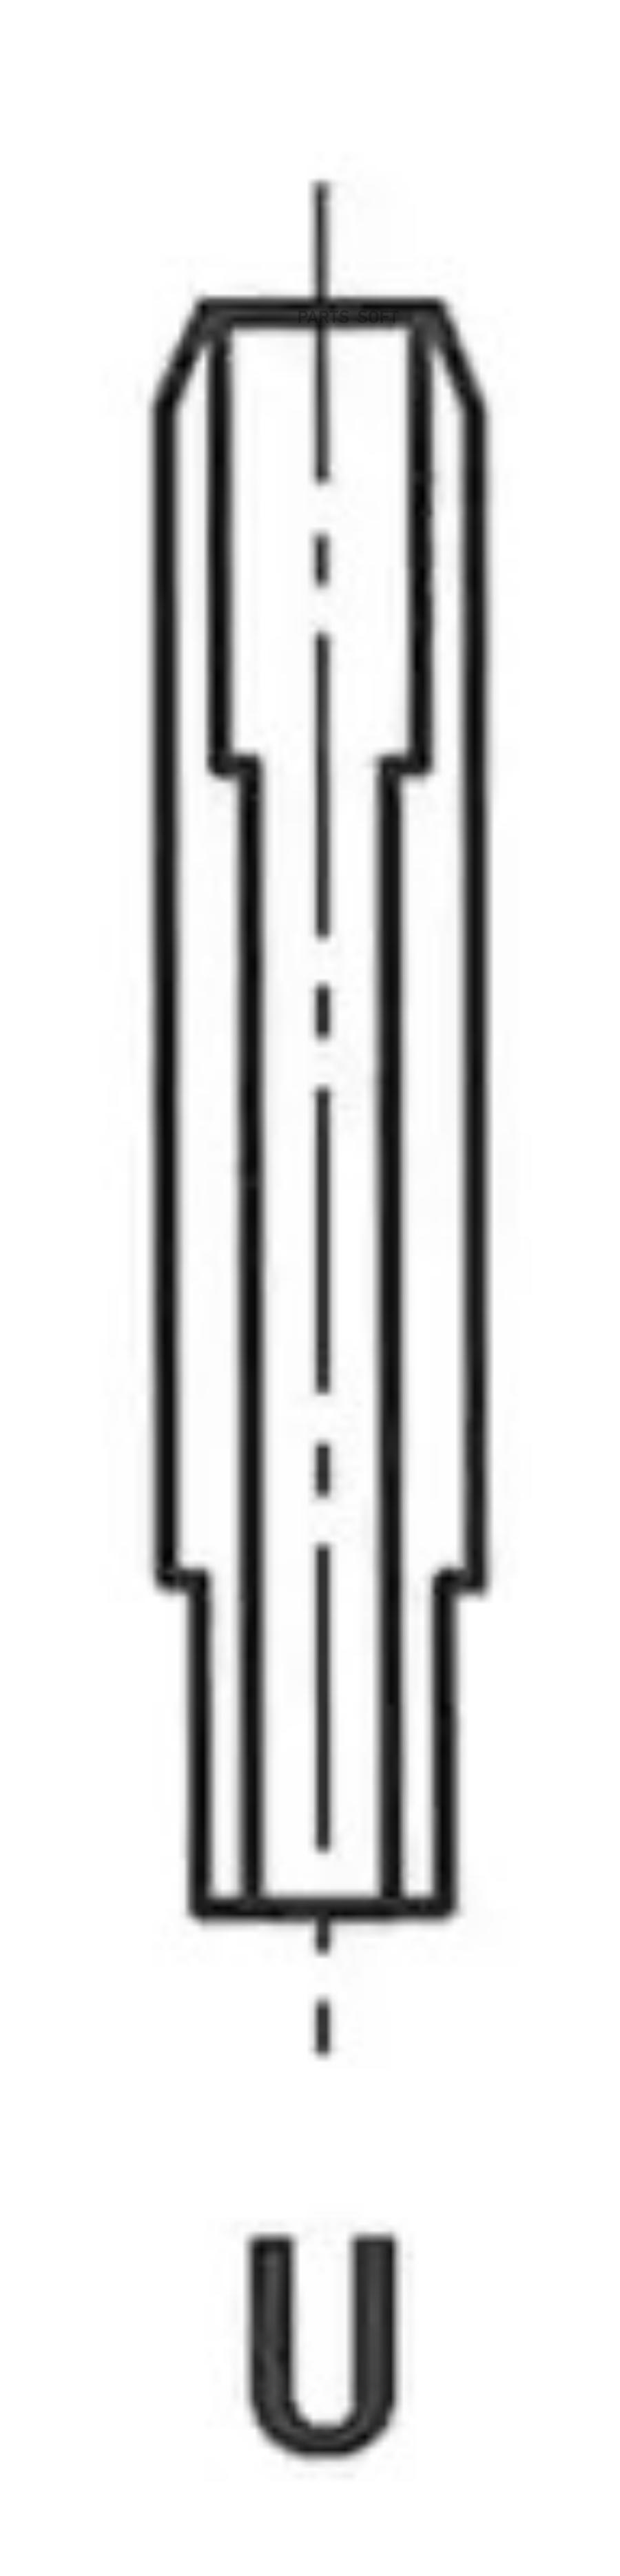 Направляющая втулка клапана